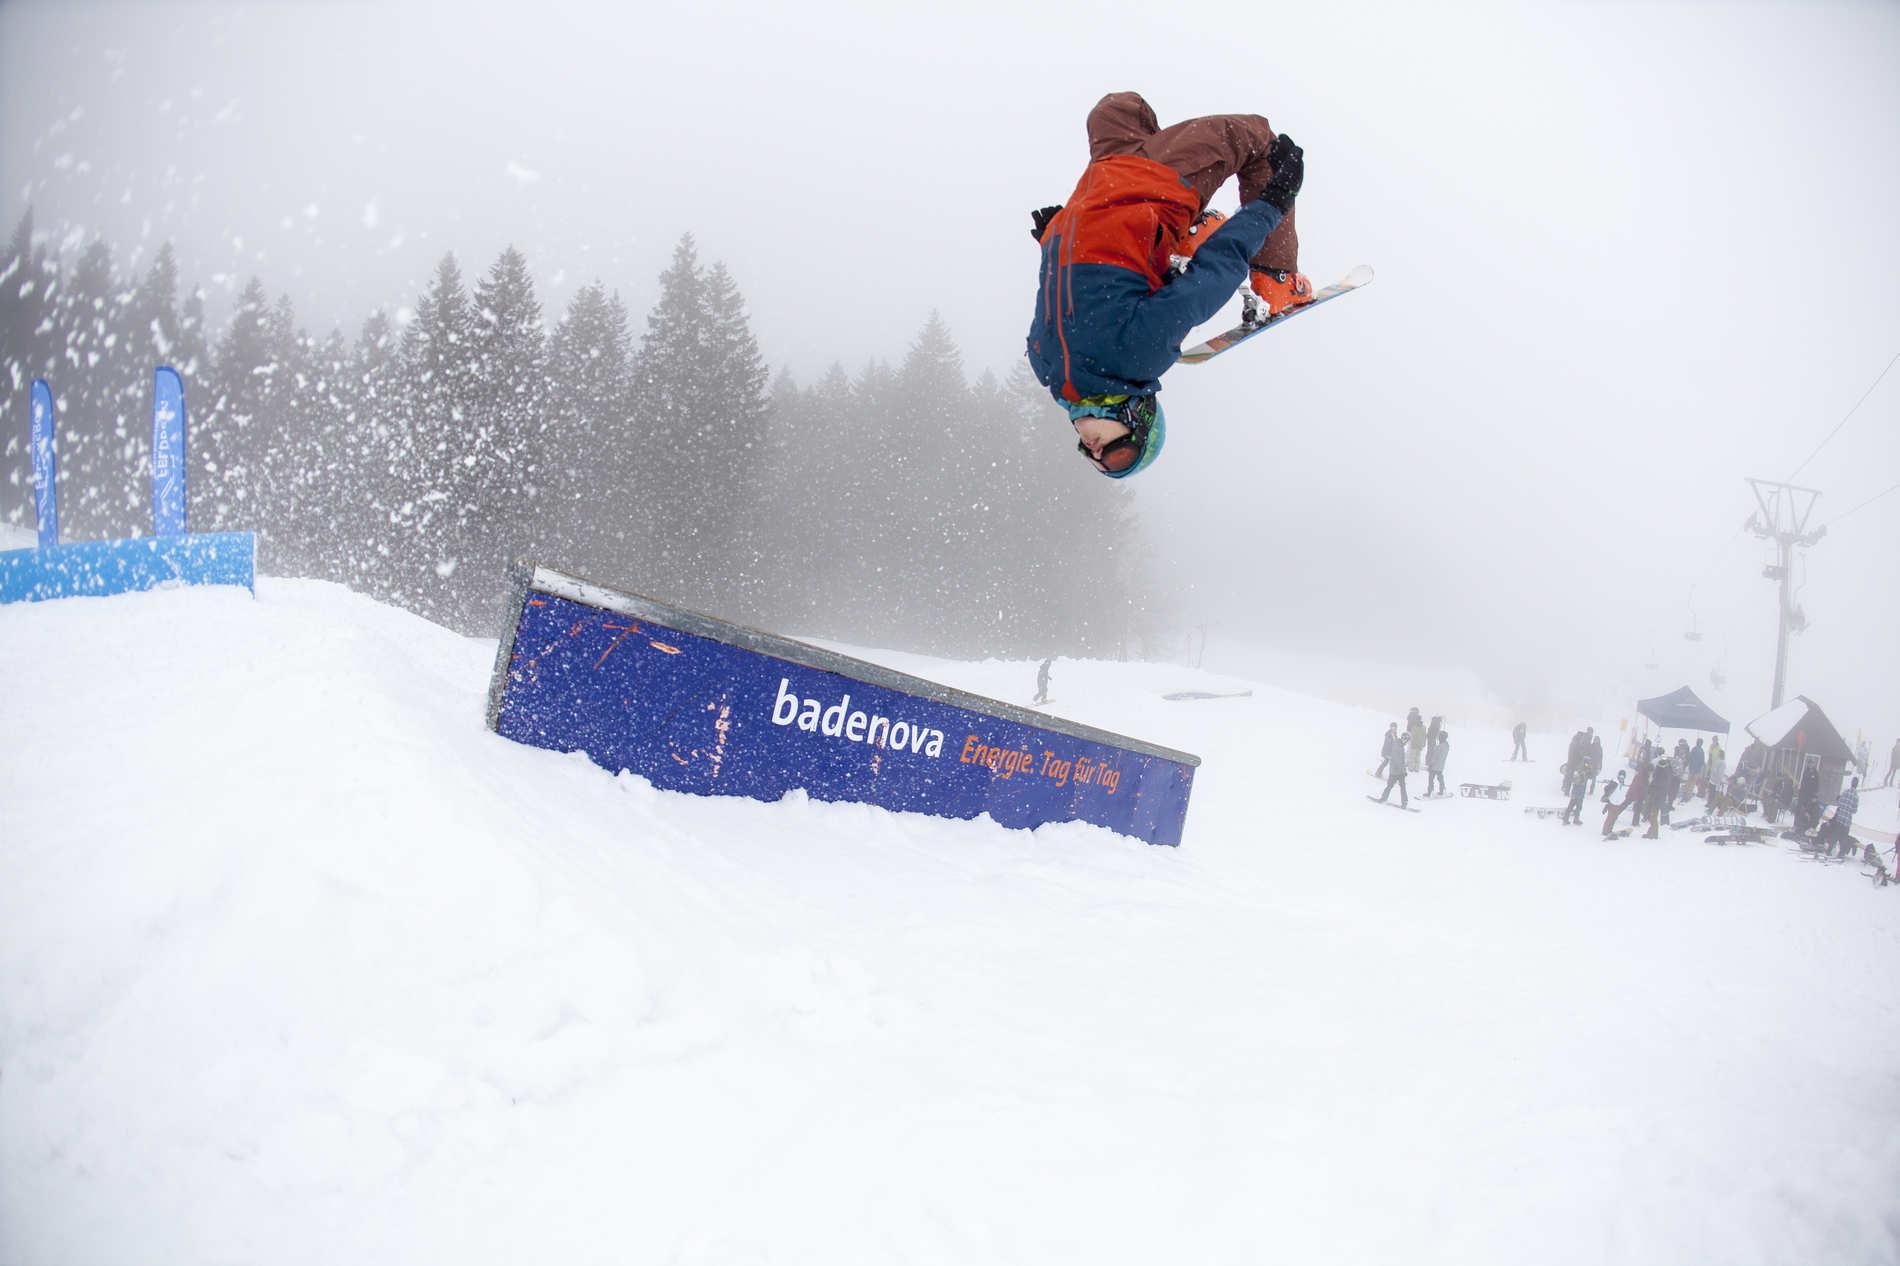 web snowpark feldberg 17 03 2018 action fs unknown martin herrmann qparks 1